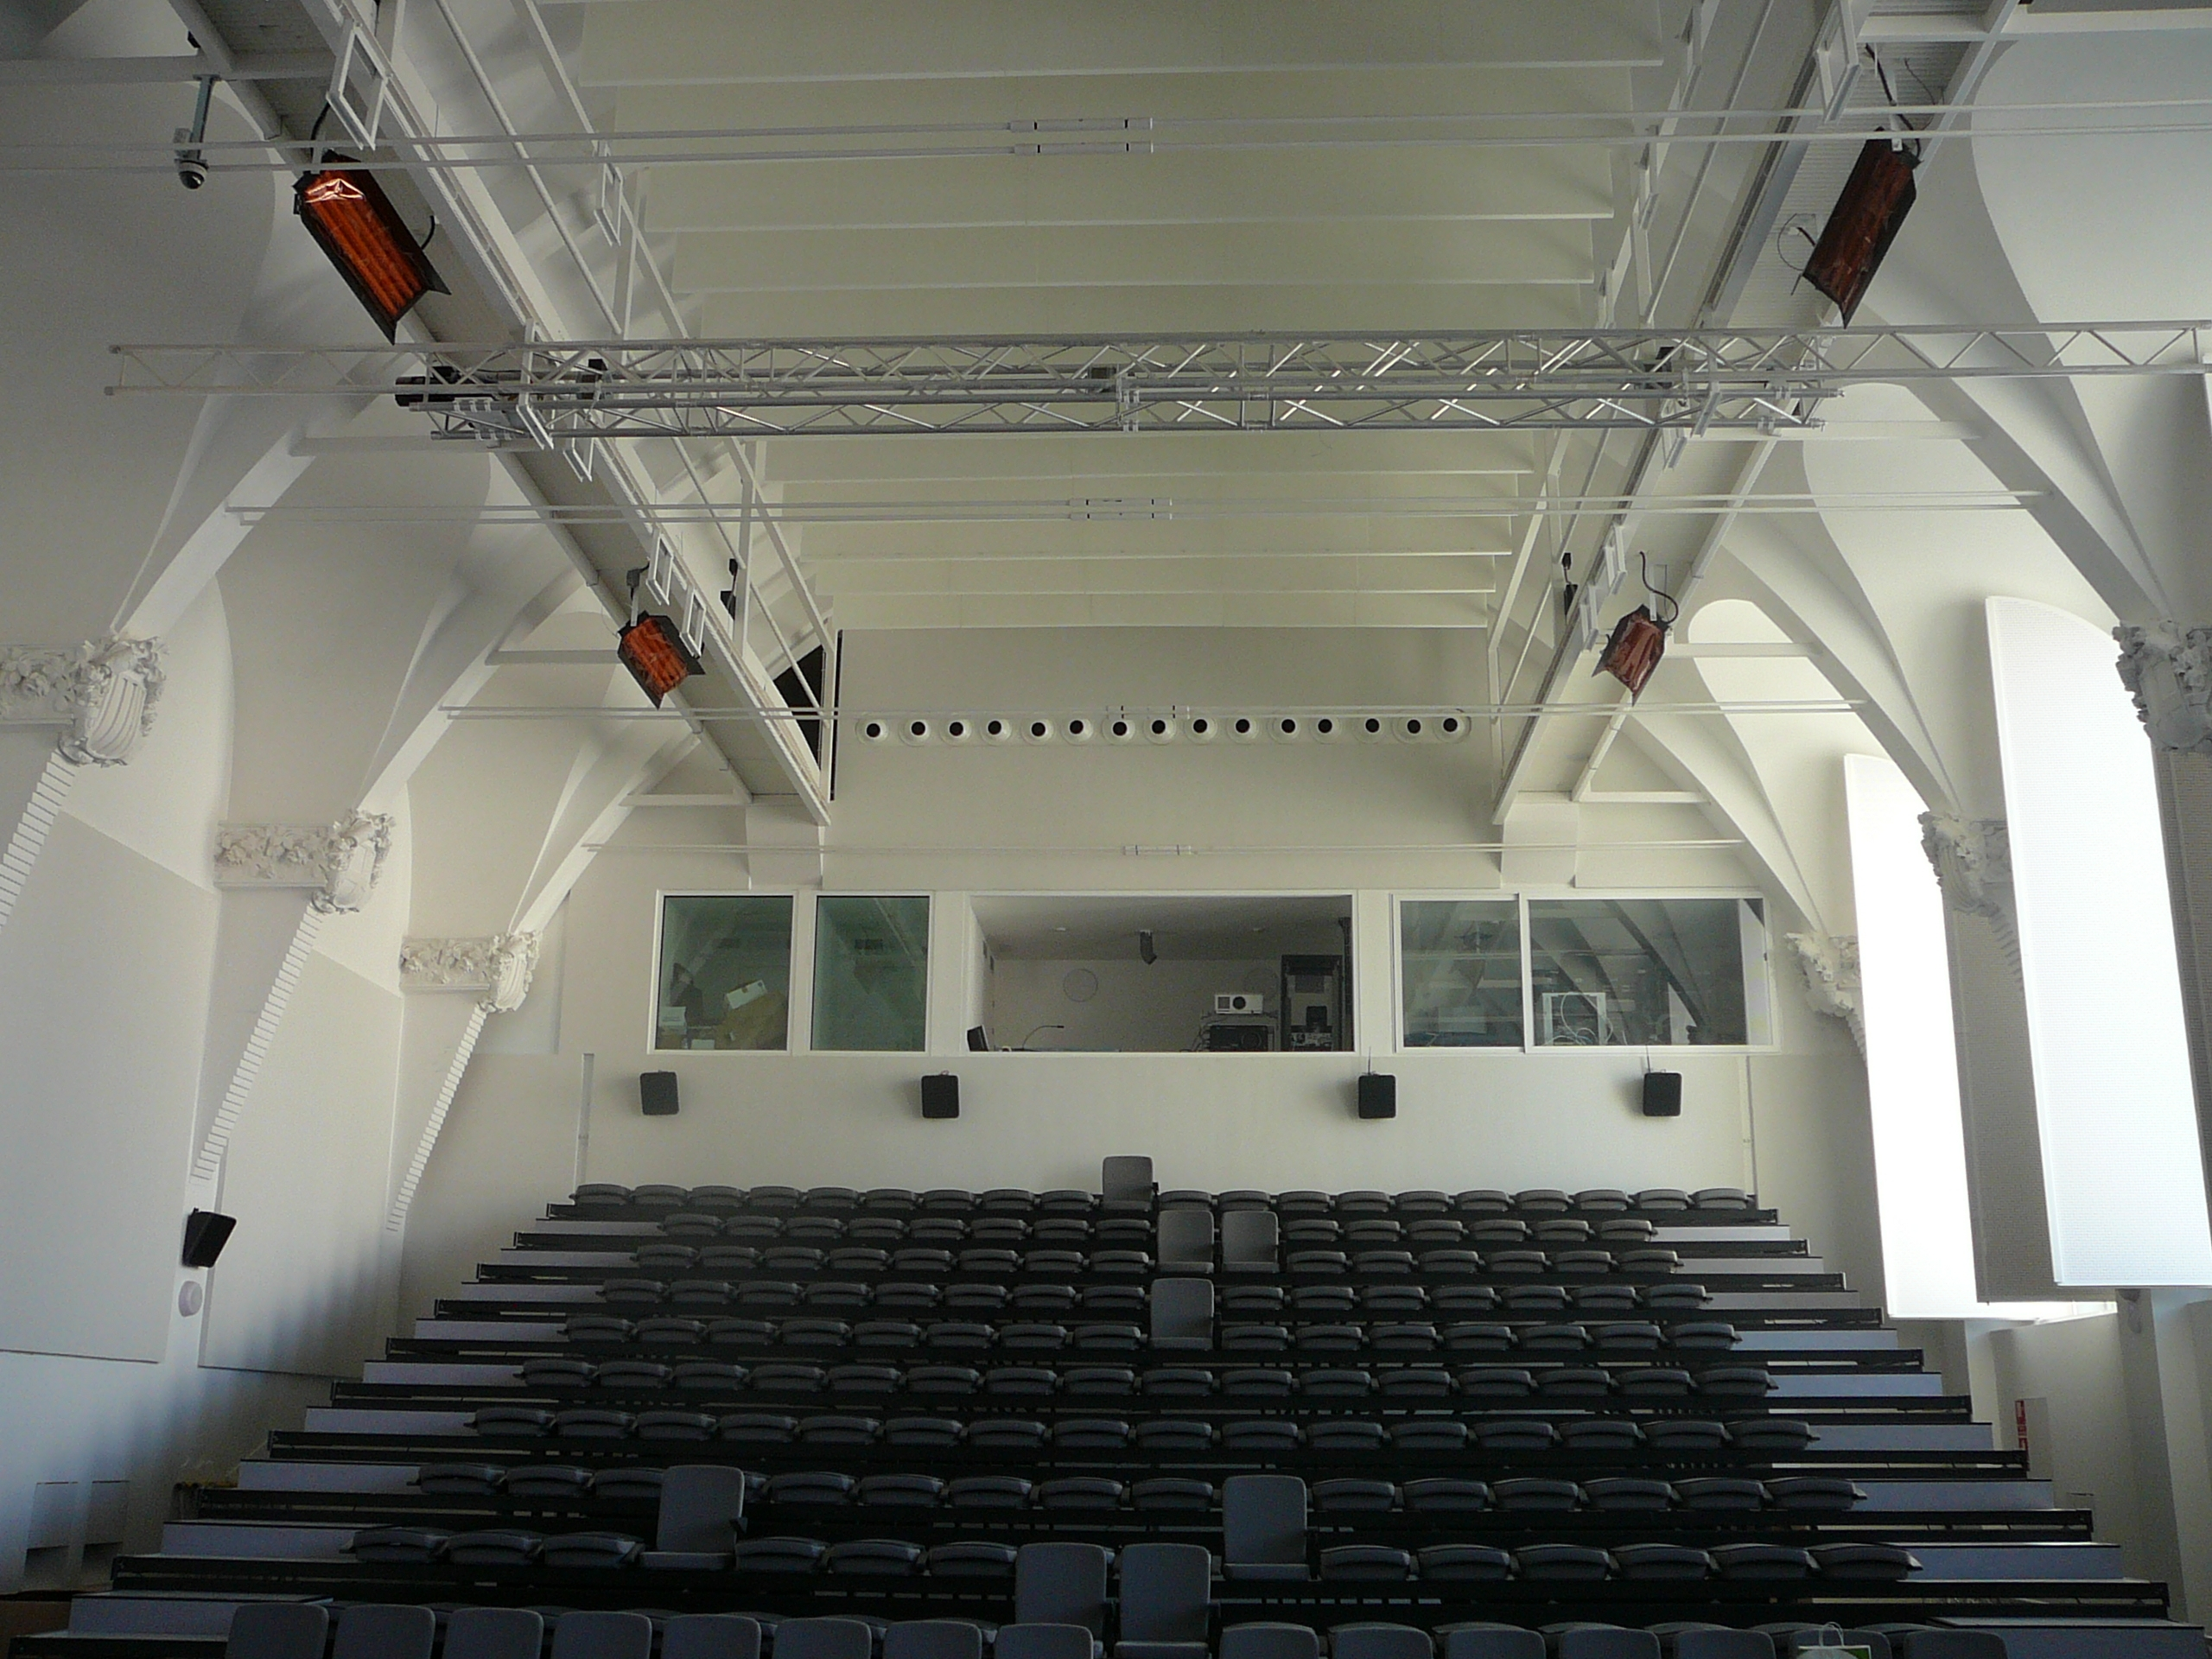 Sala Teatre pinta phonestop V + pinta absorber plano